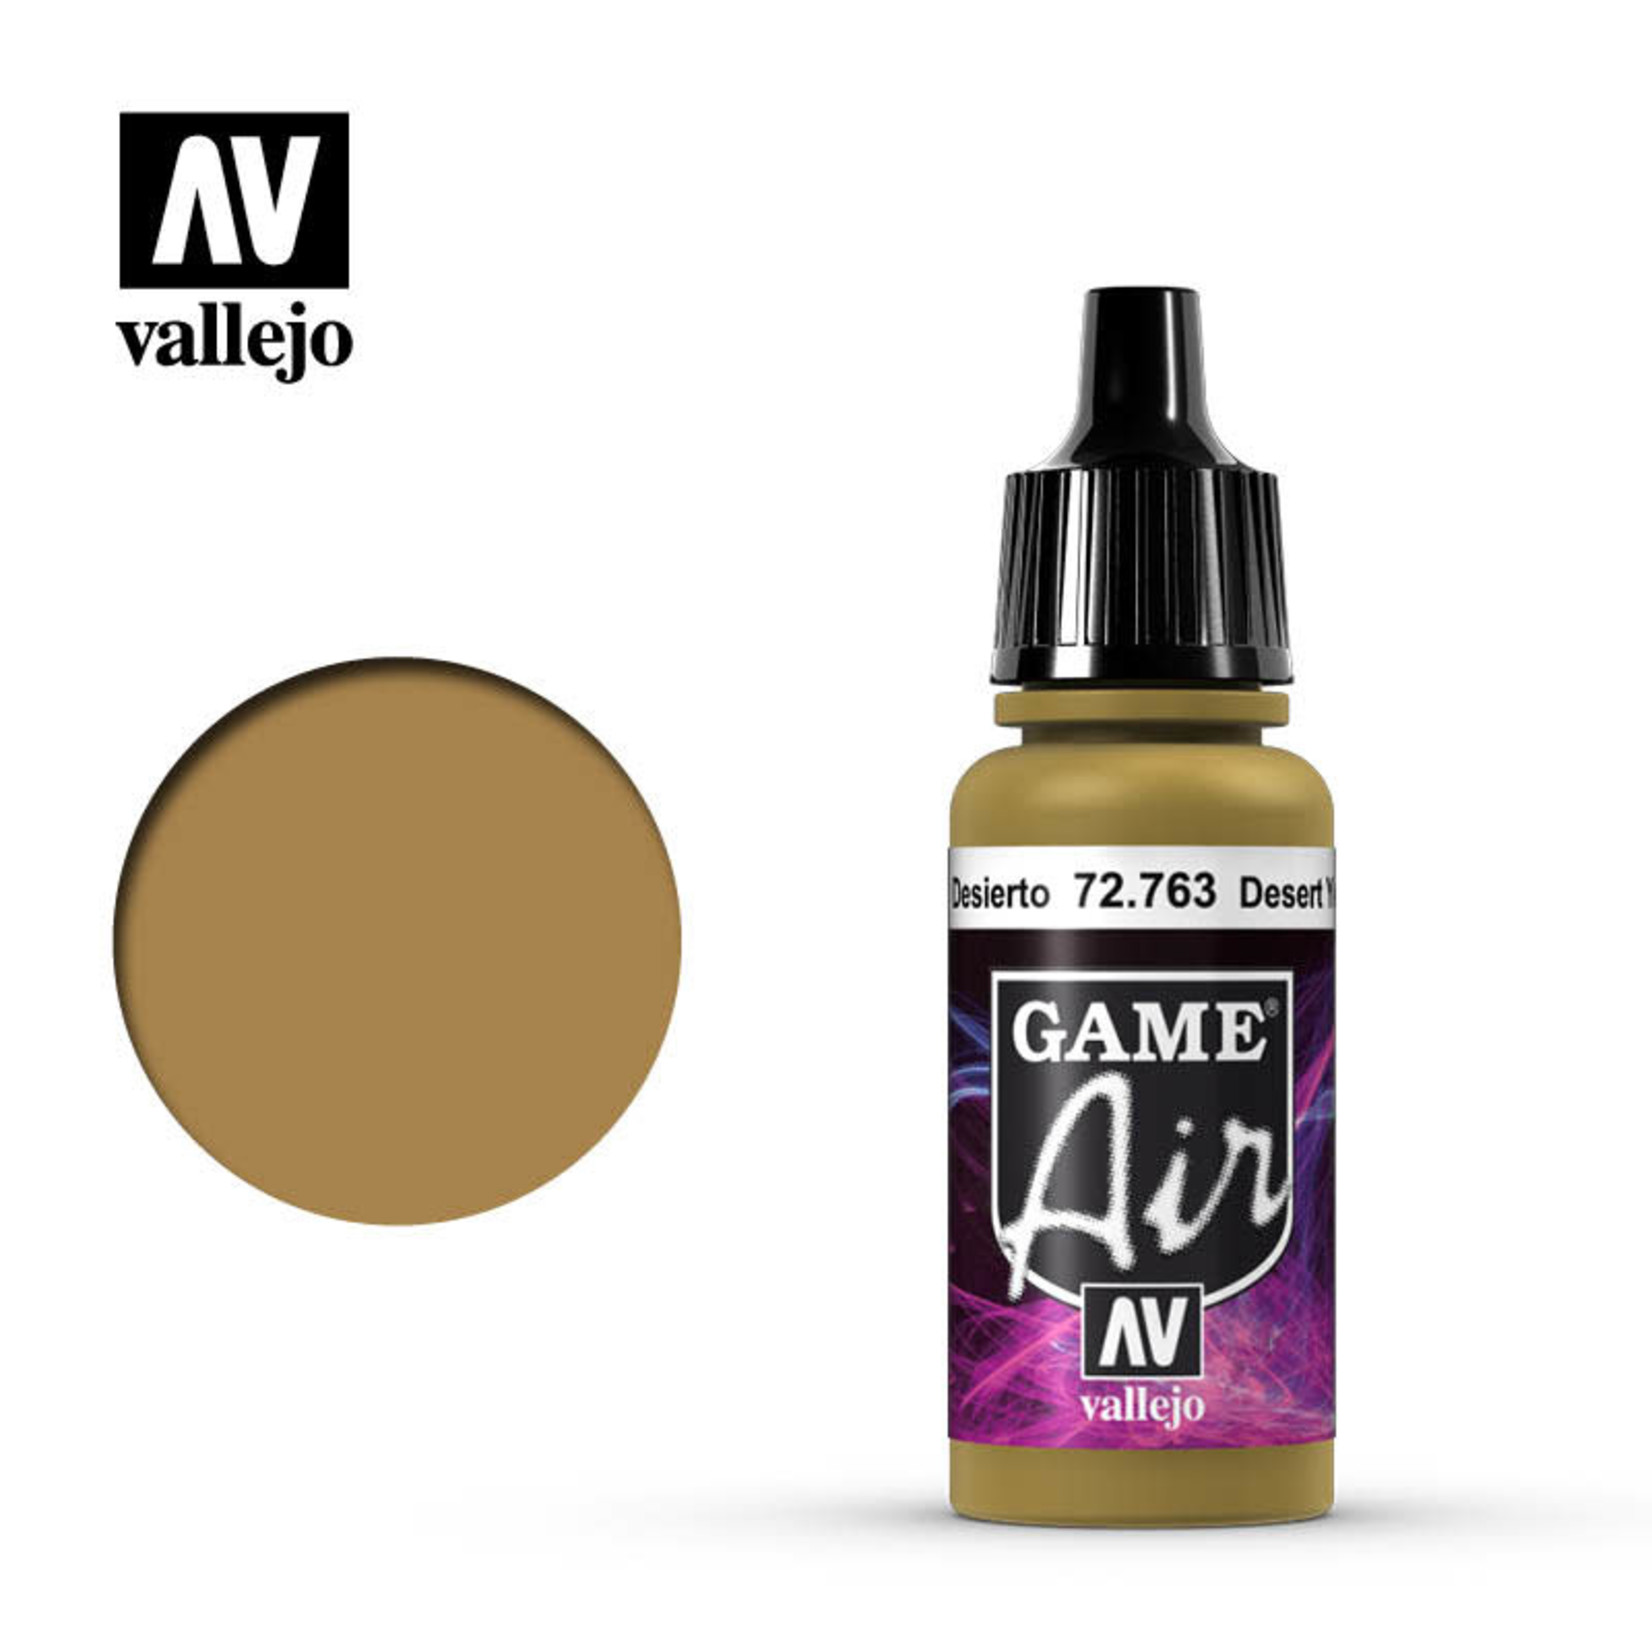 Vallejo Vallejo: Game Air: Desert Yellow